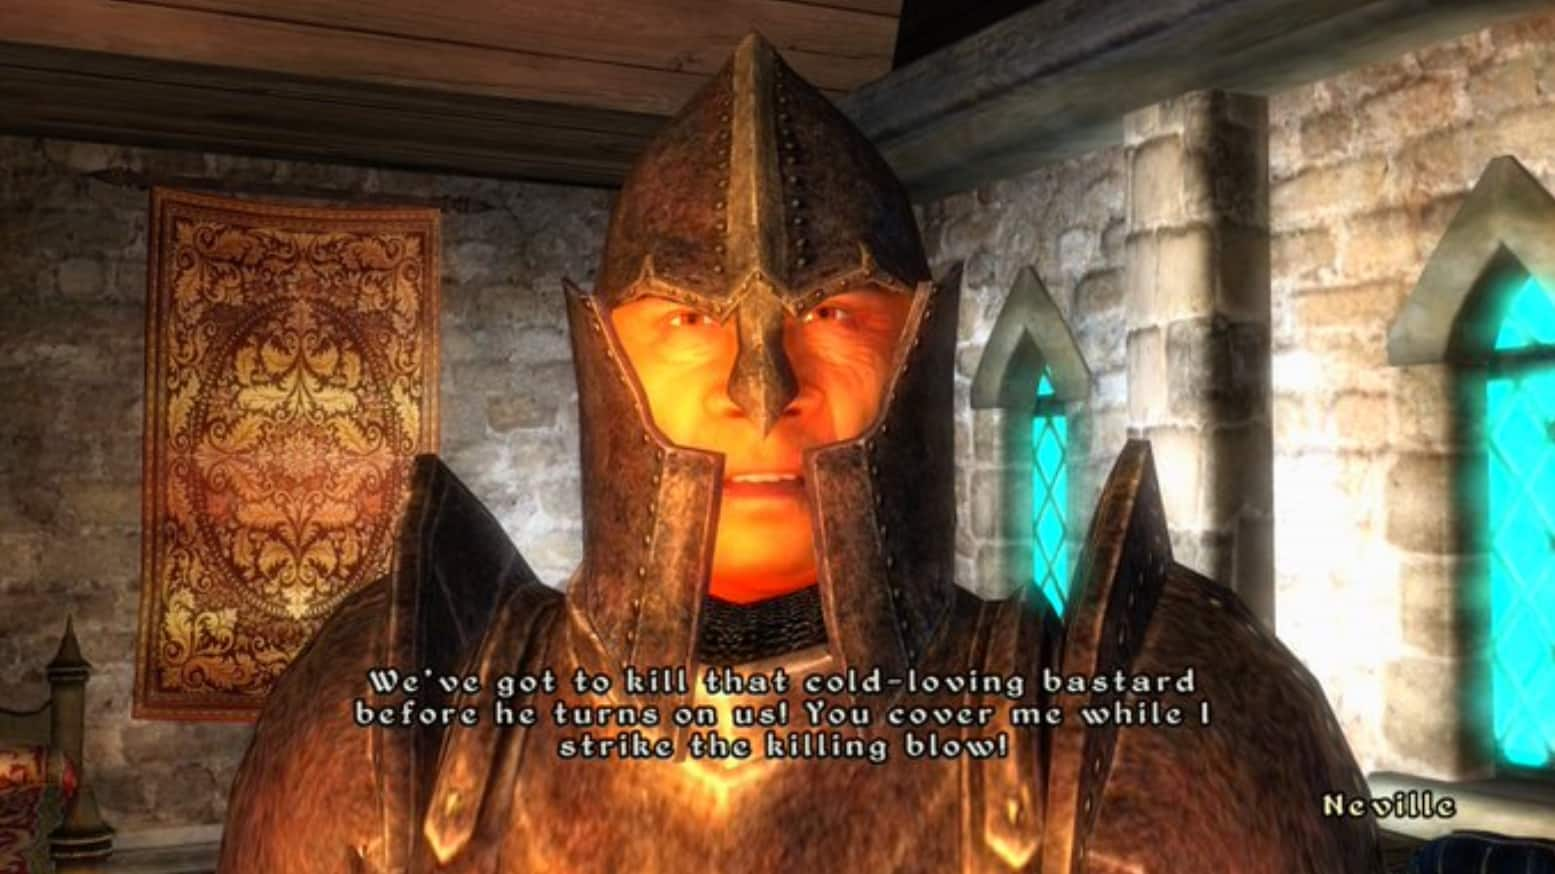 Bethesda The Elder Scrolls IV: Oblivion V: Skyrim Dark Brotherhood assassination more immersive, scary, realistic experience than Hitman 3 World of Assassination IO Interactive